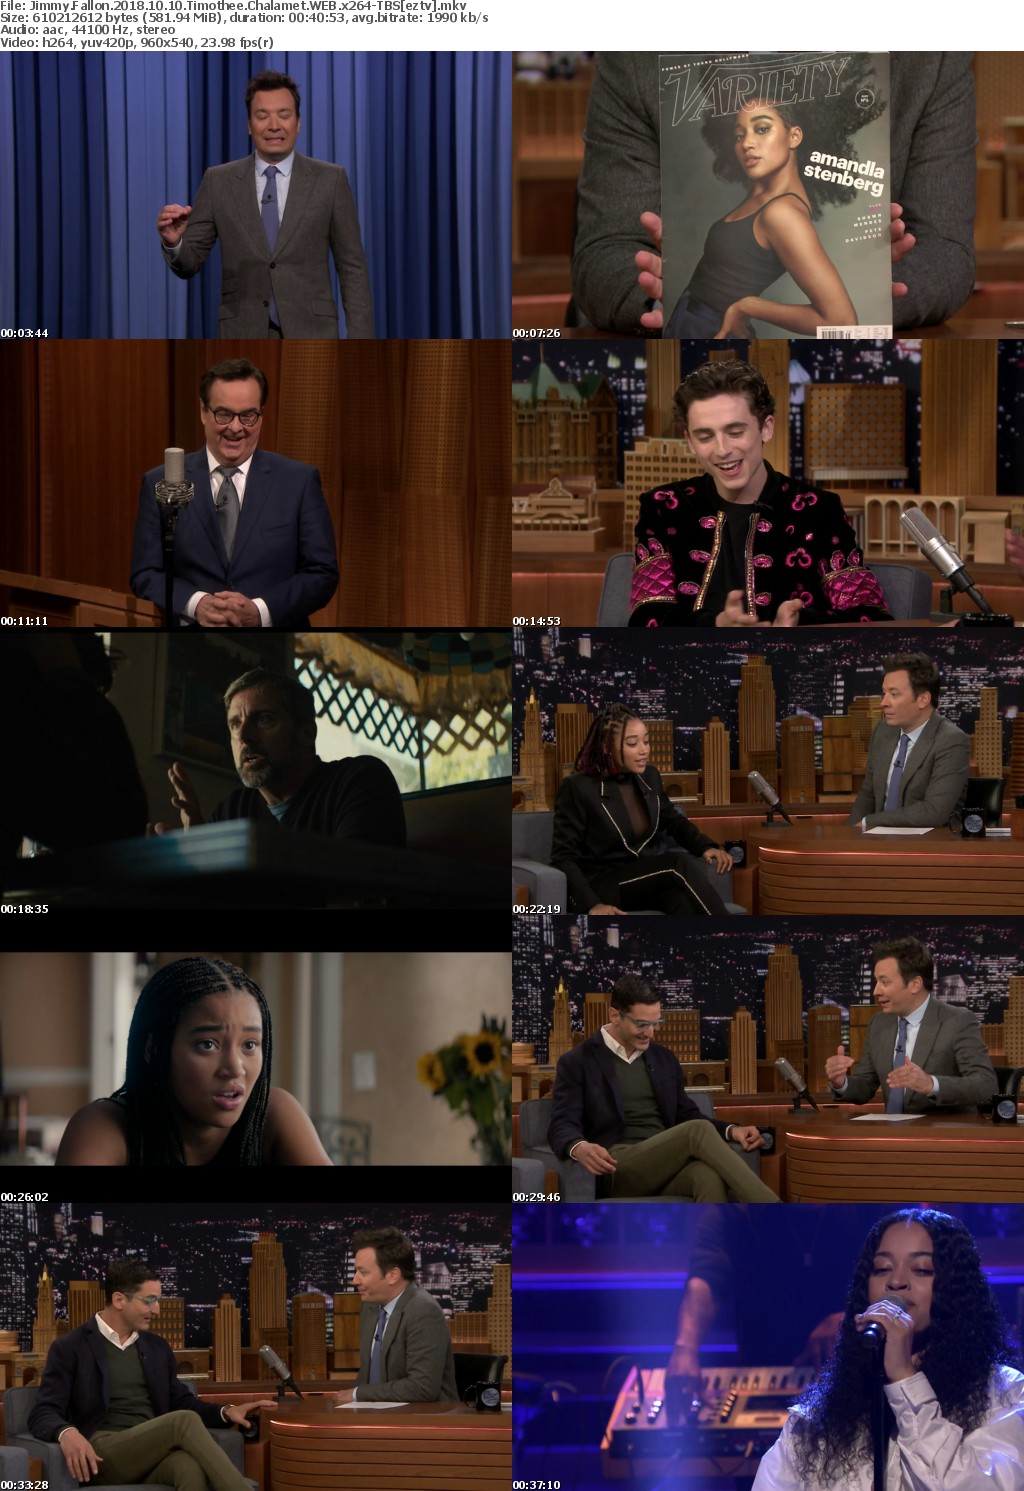 Jimmy Fallon 2018 10 10 Timothee Chalamet WEB x264-TBS